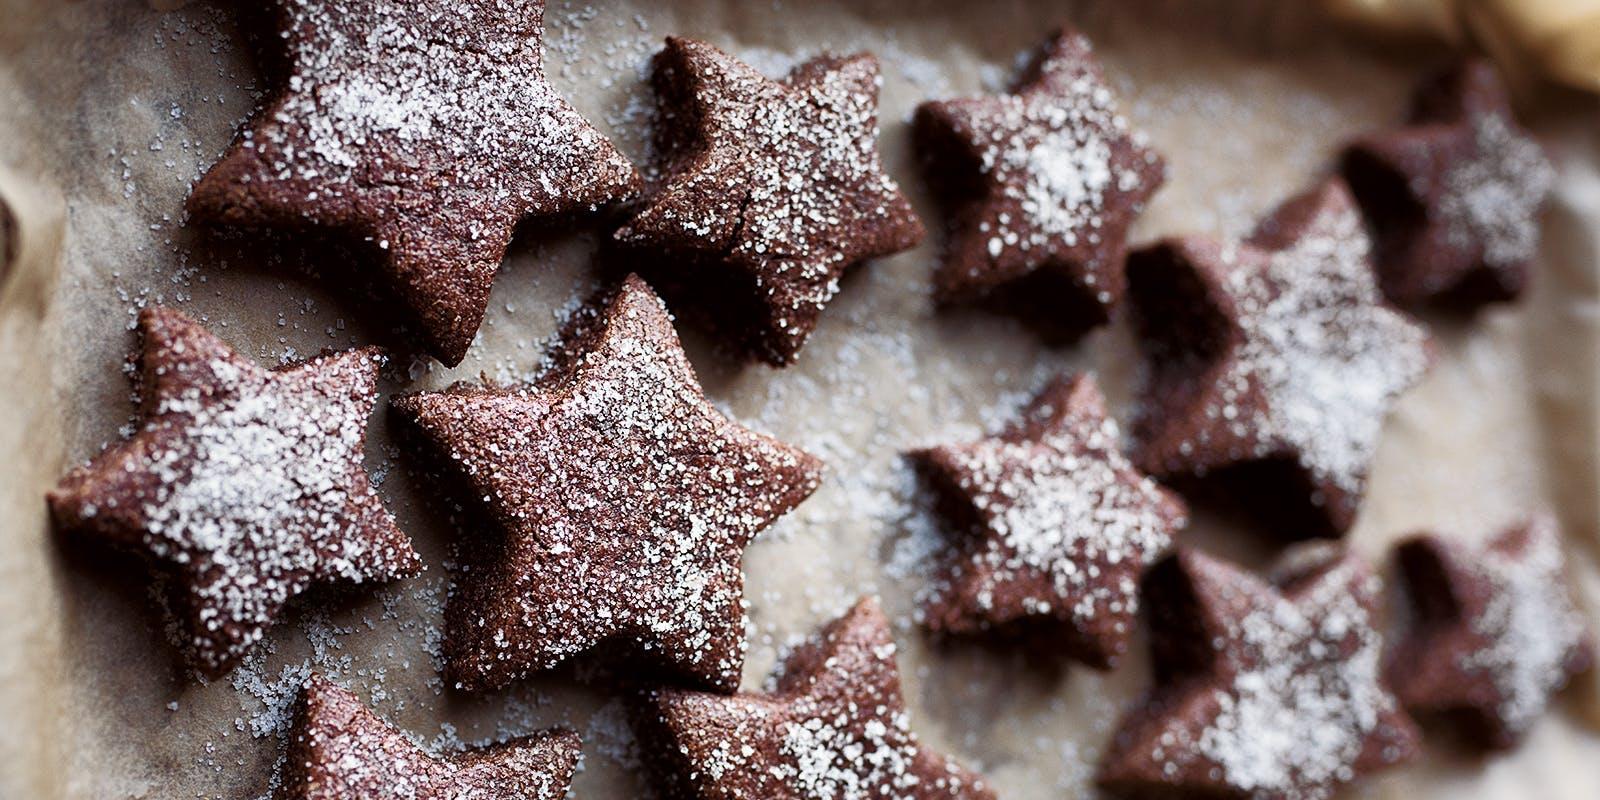 Brunsli chocolate cookies